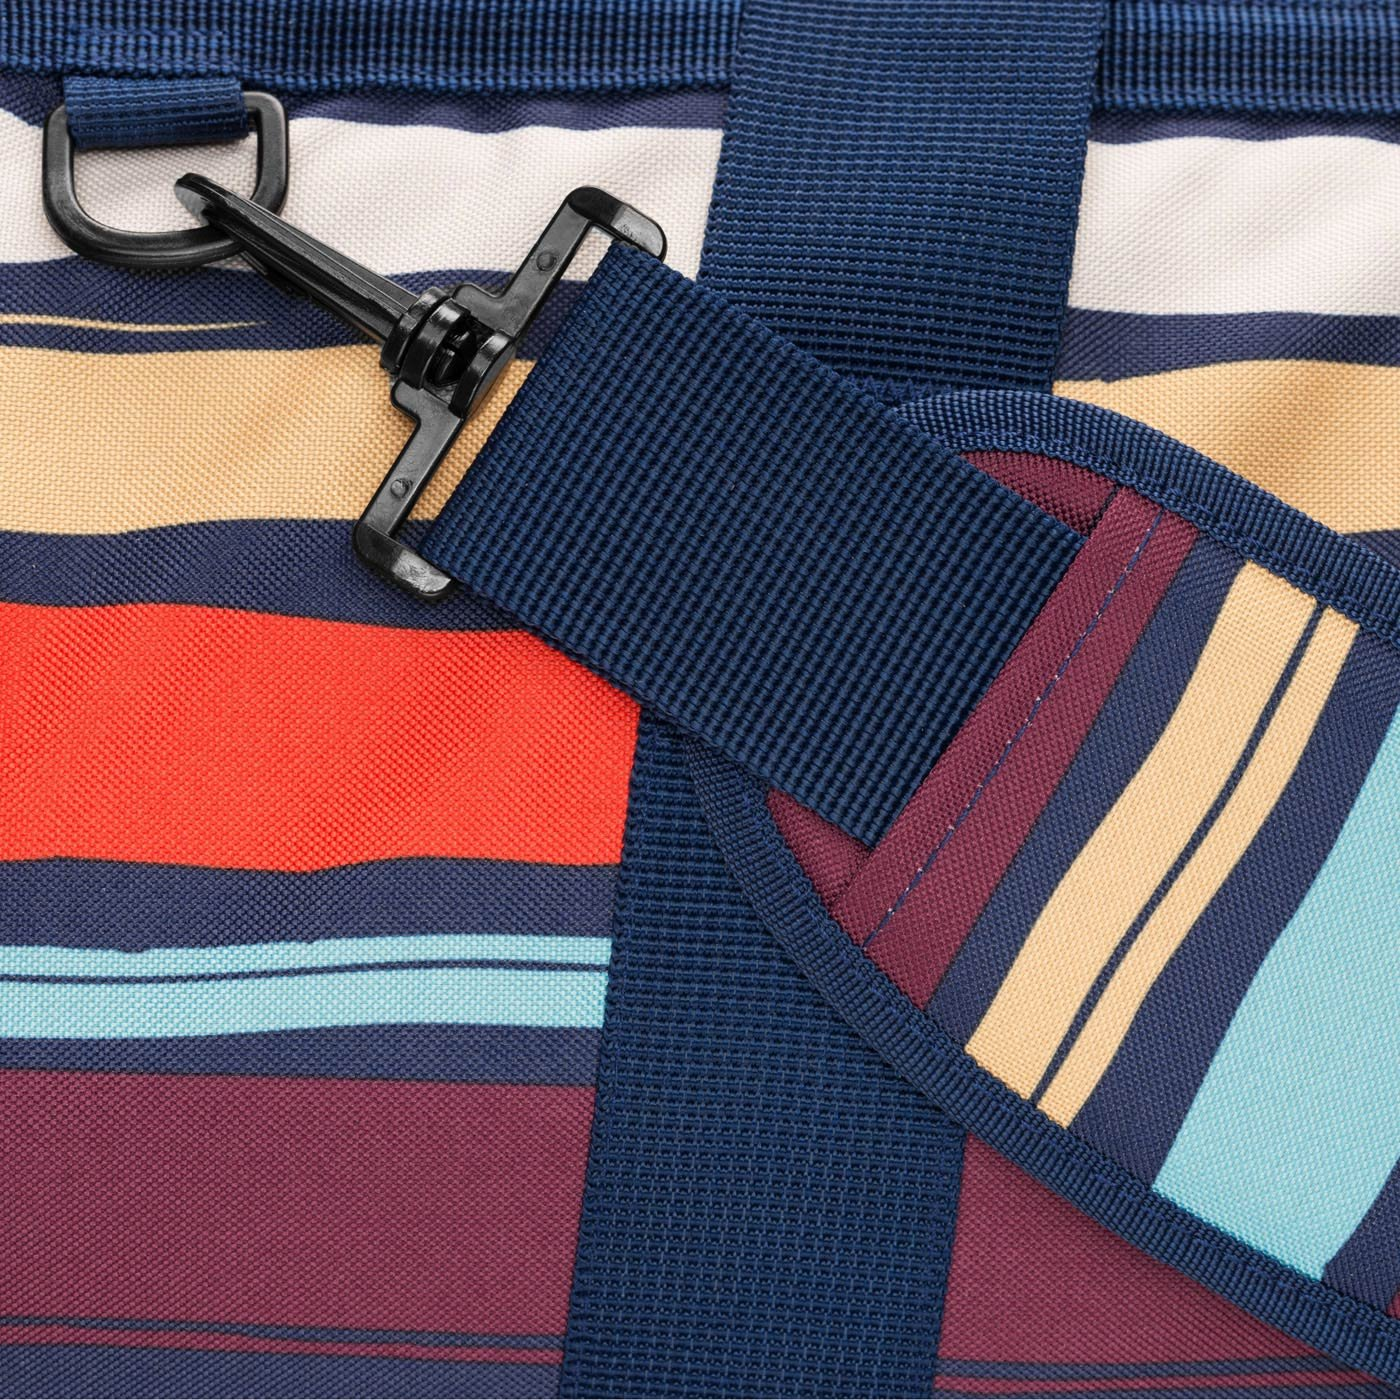 Mehrfarbig Gestreift Multicolore 30 liters Reisenthel Artist Stripes Borsone 48 cm